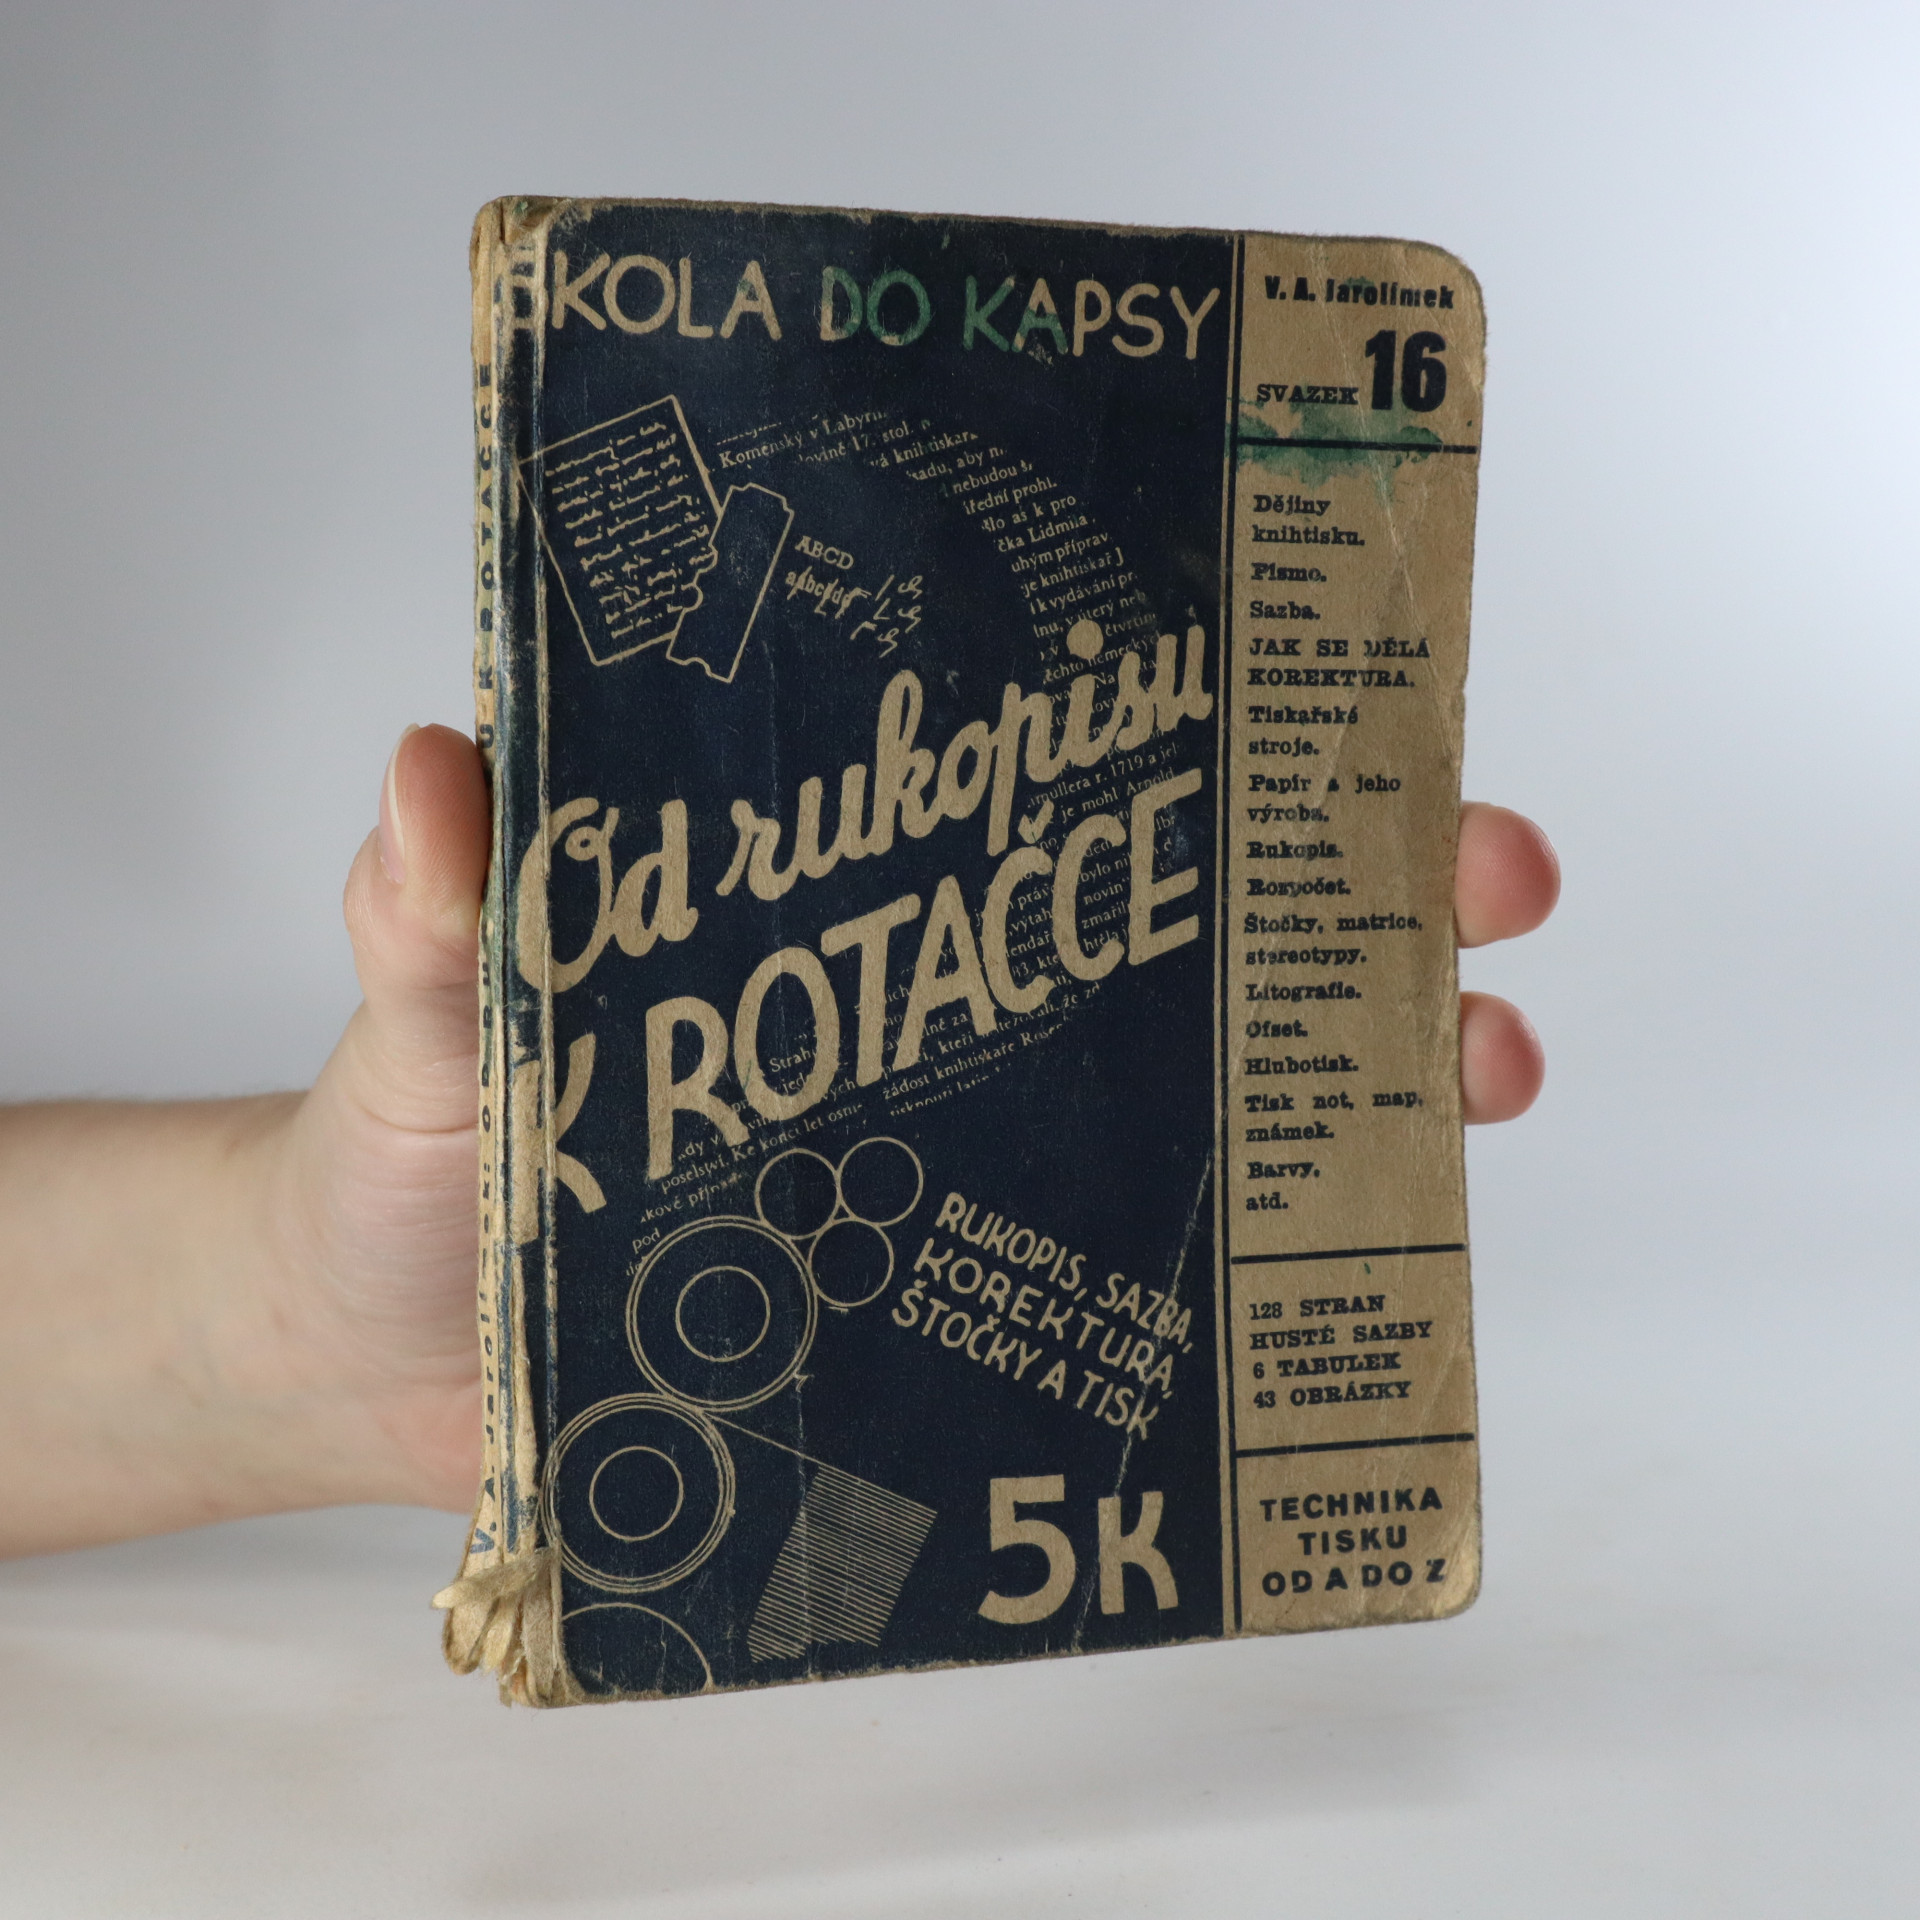 antikvární kniha Od rukopisu k rotačce. Svazek 16, 1941